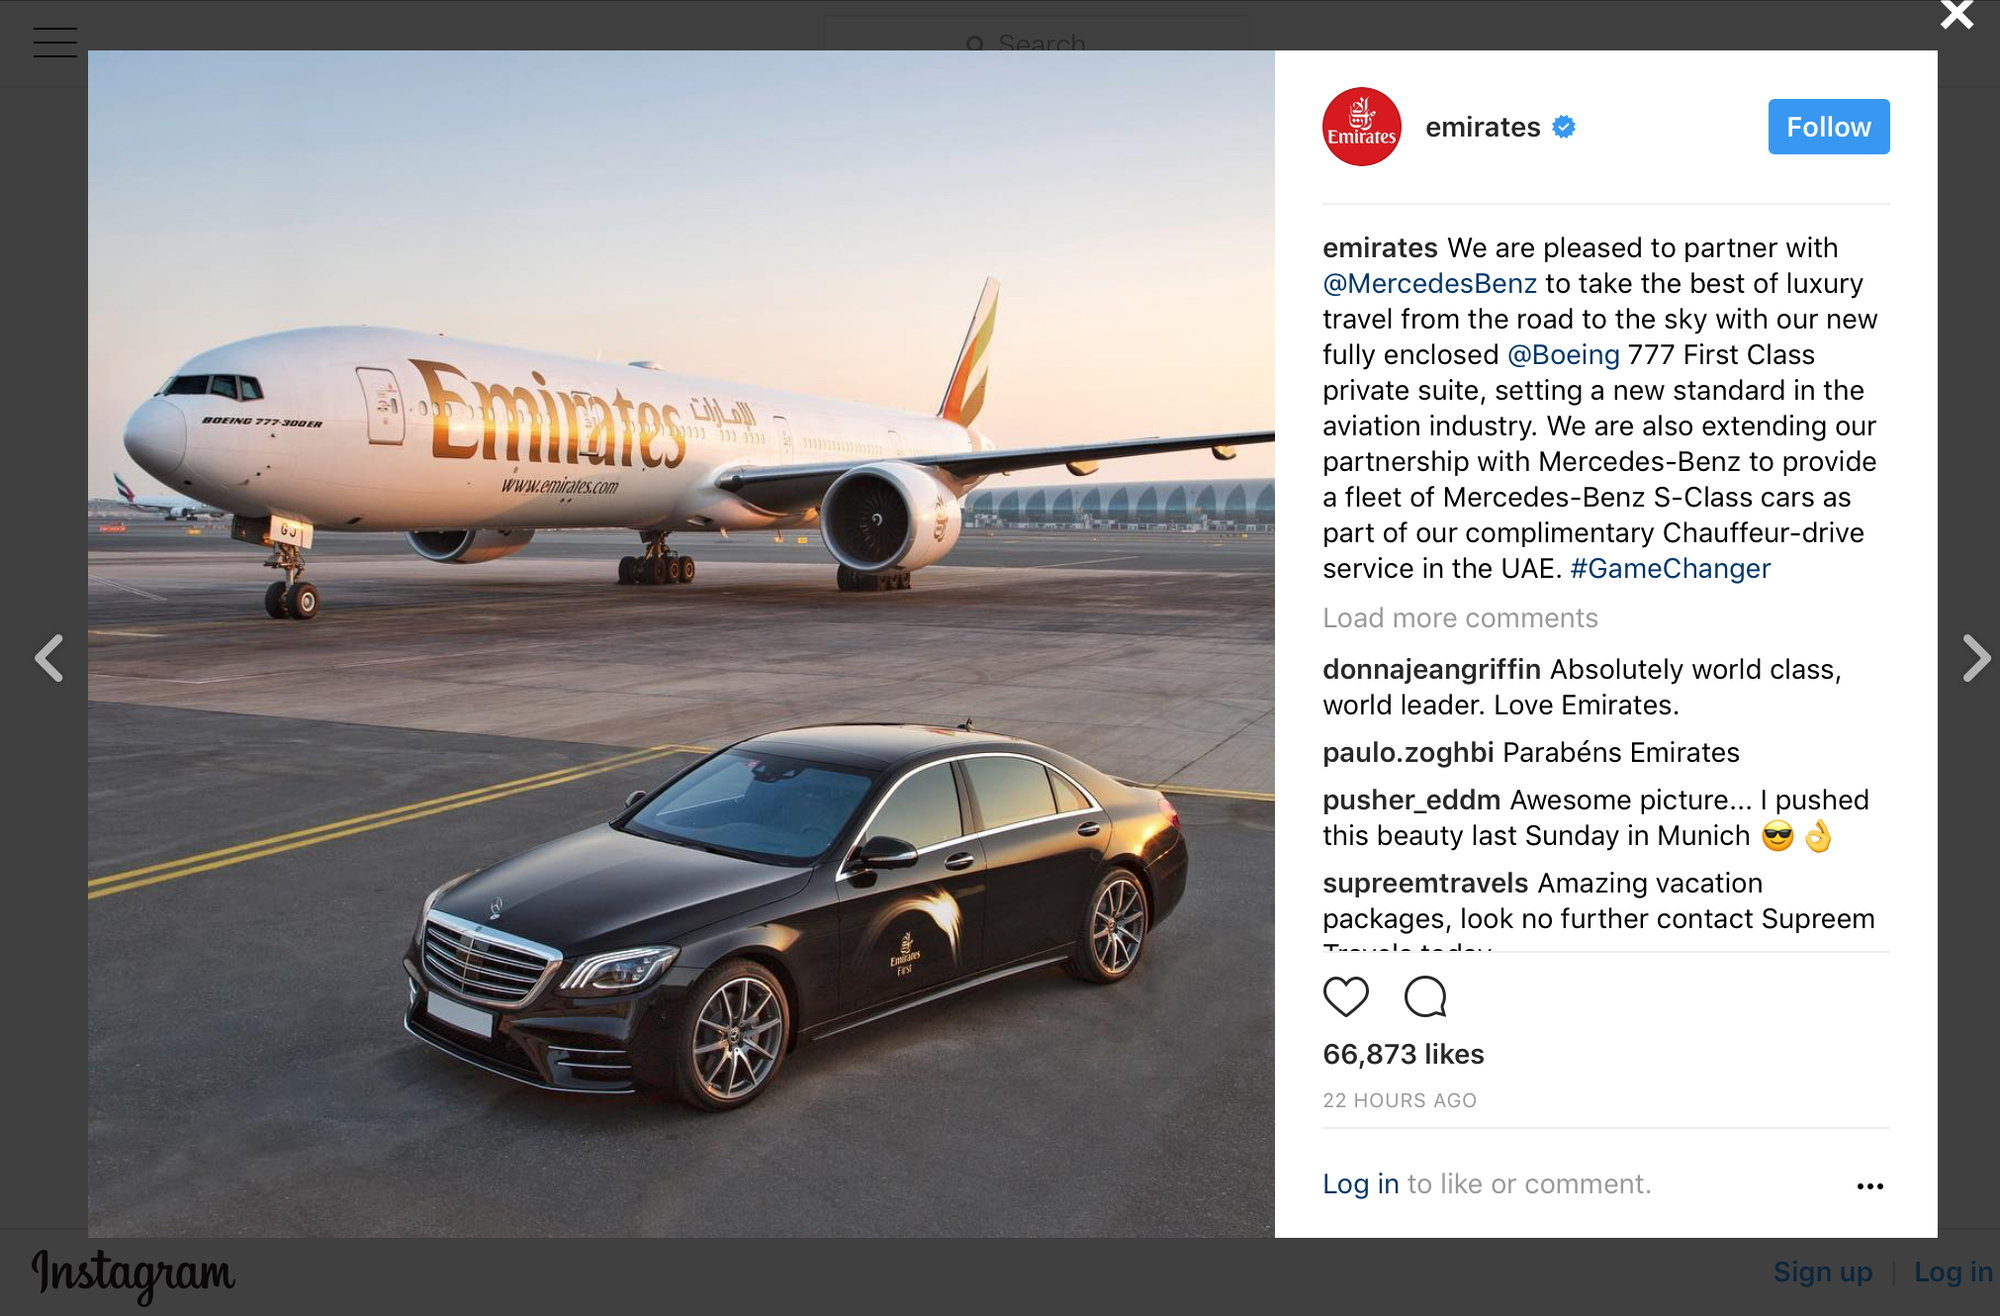 777 New First Class - Page 12 - FlyerTalk Forums